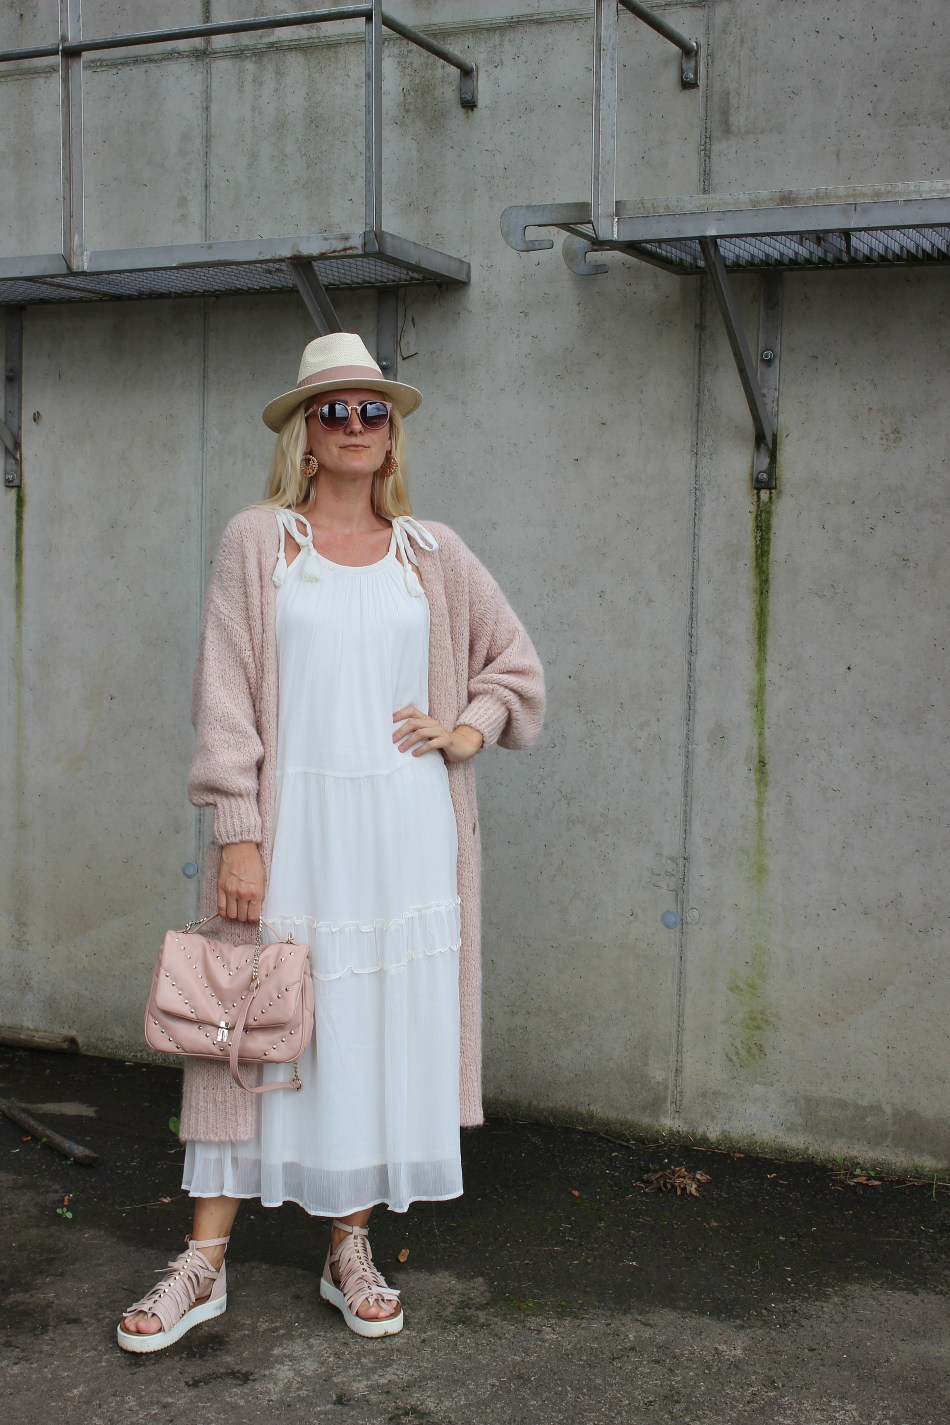 Vero Moda-Bestseller-Weißes Maxikleid-Sandalen Nieten-Valentino Rockstud Bag-Zara Nieten rosa Tasche-Tamara Prutsch-carrieslifestyle